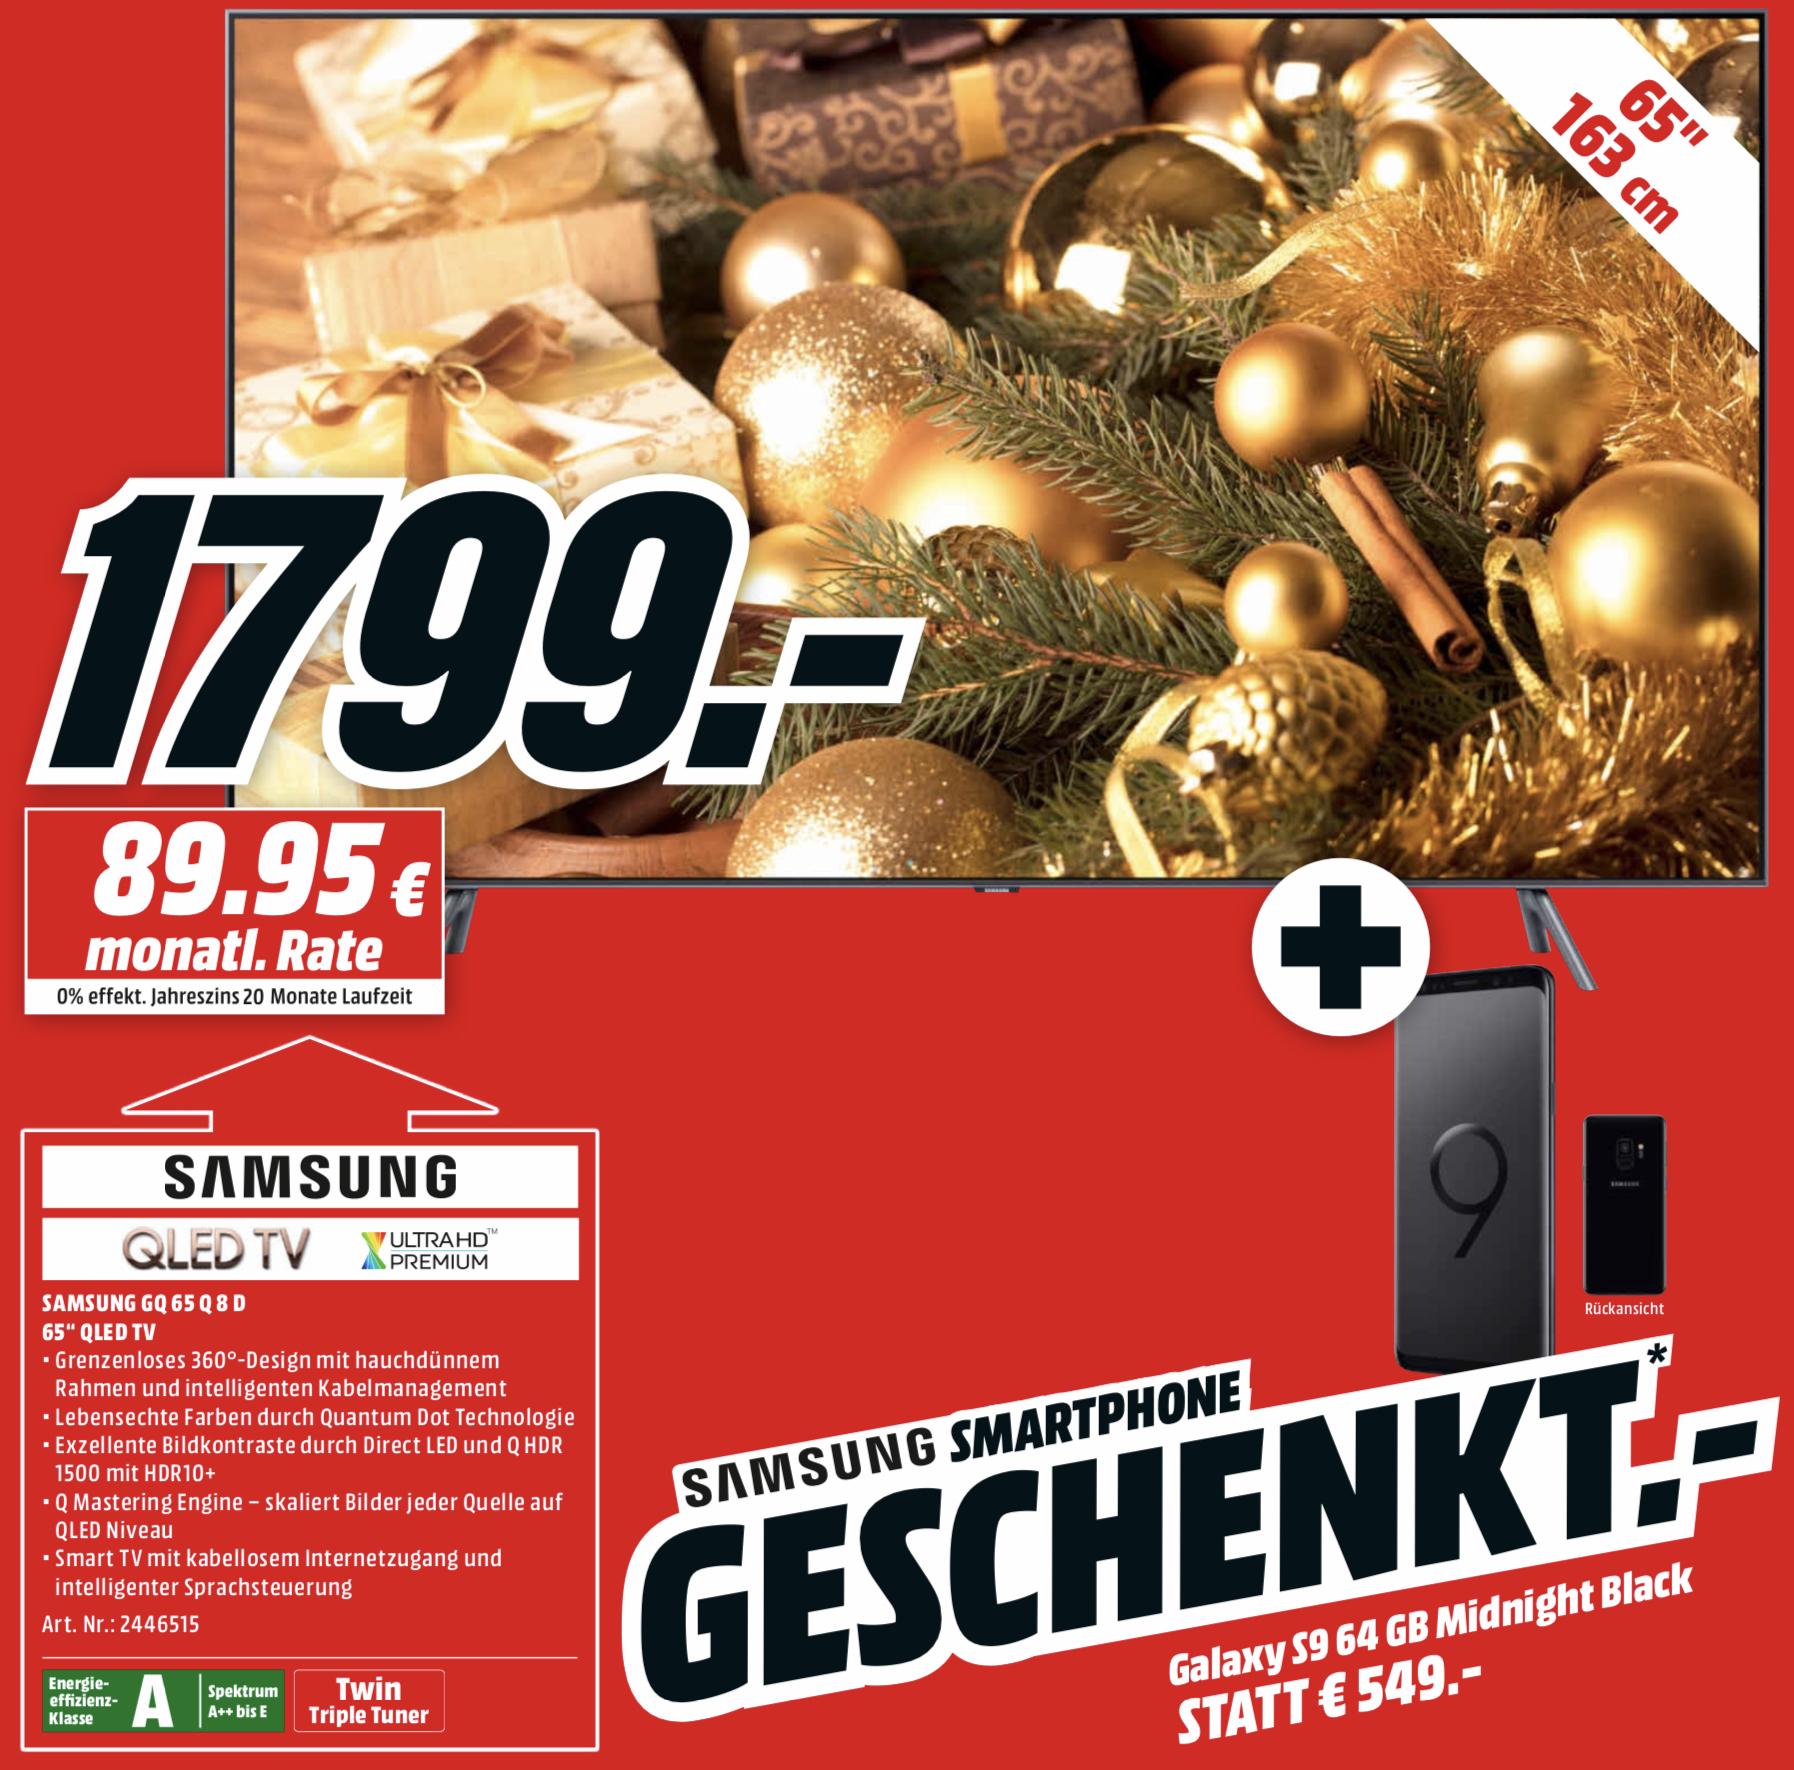 samsung gq65q8d qled tv samsung galaxy s9 smartphone geschenkt f r 1799 10 fach payback. Black Bedroom Furniture Sets. Home Design Ideas